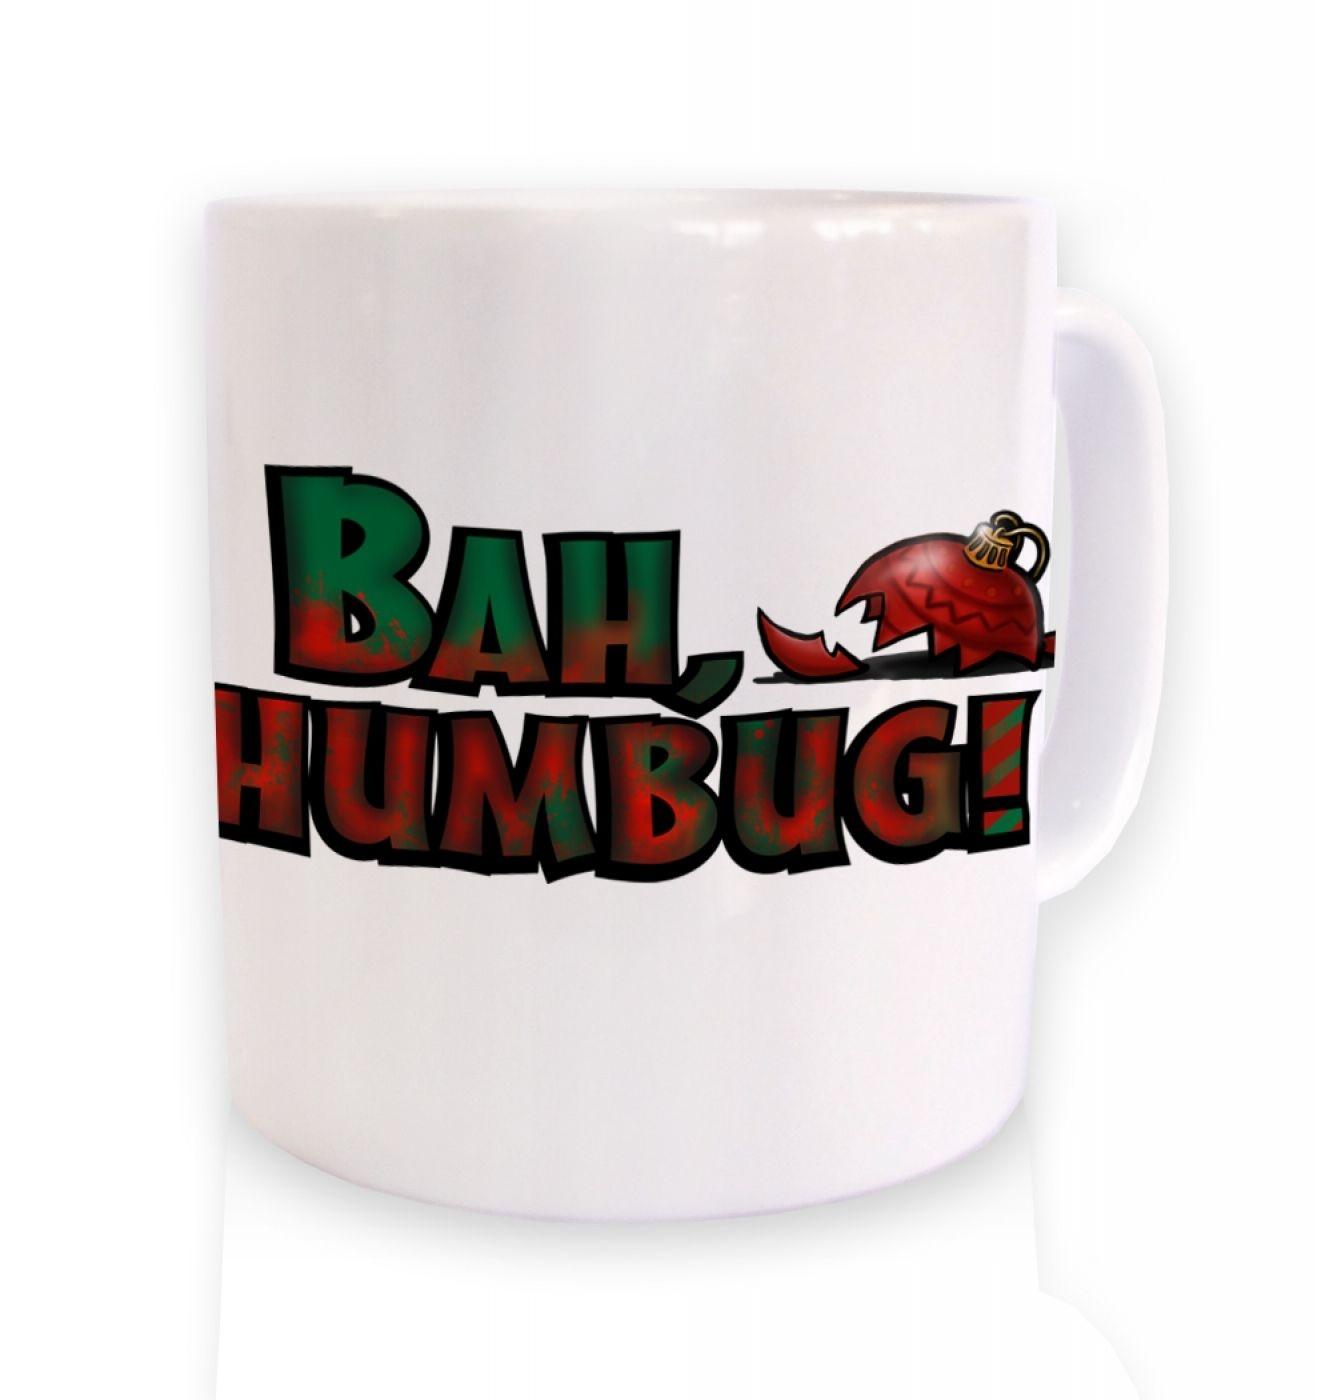 Bah humbug! ceramic mug